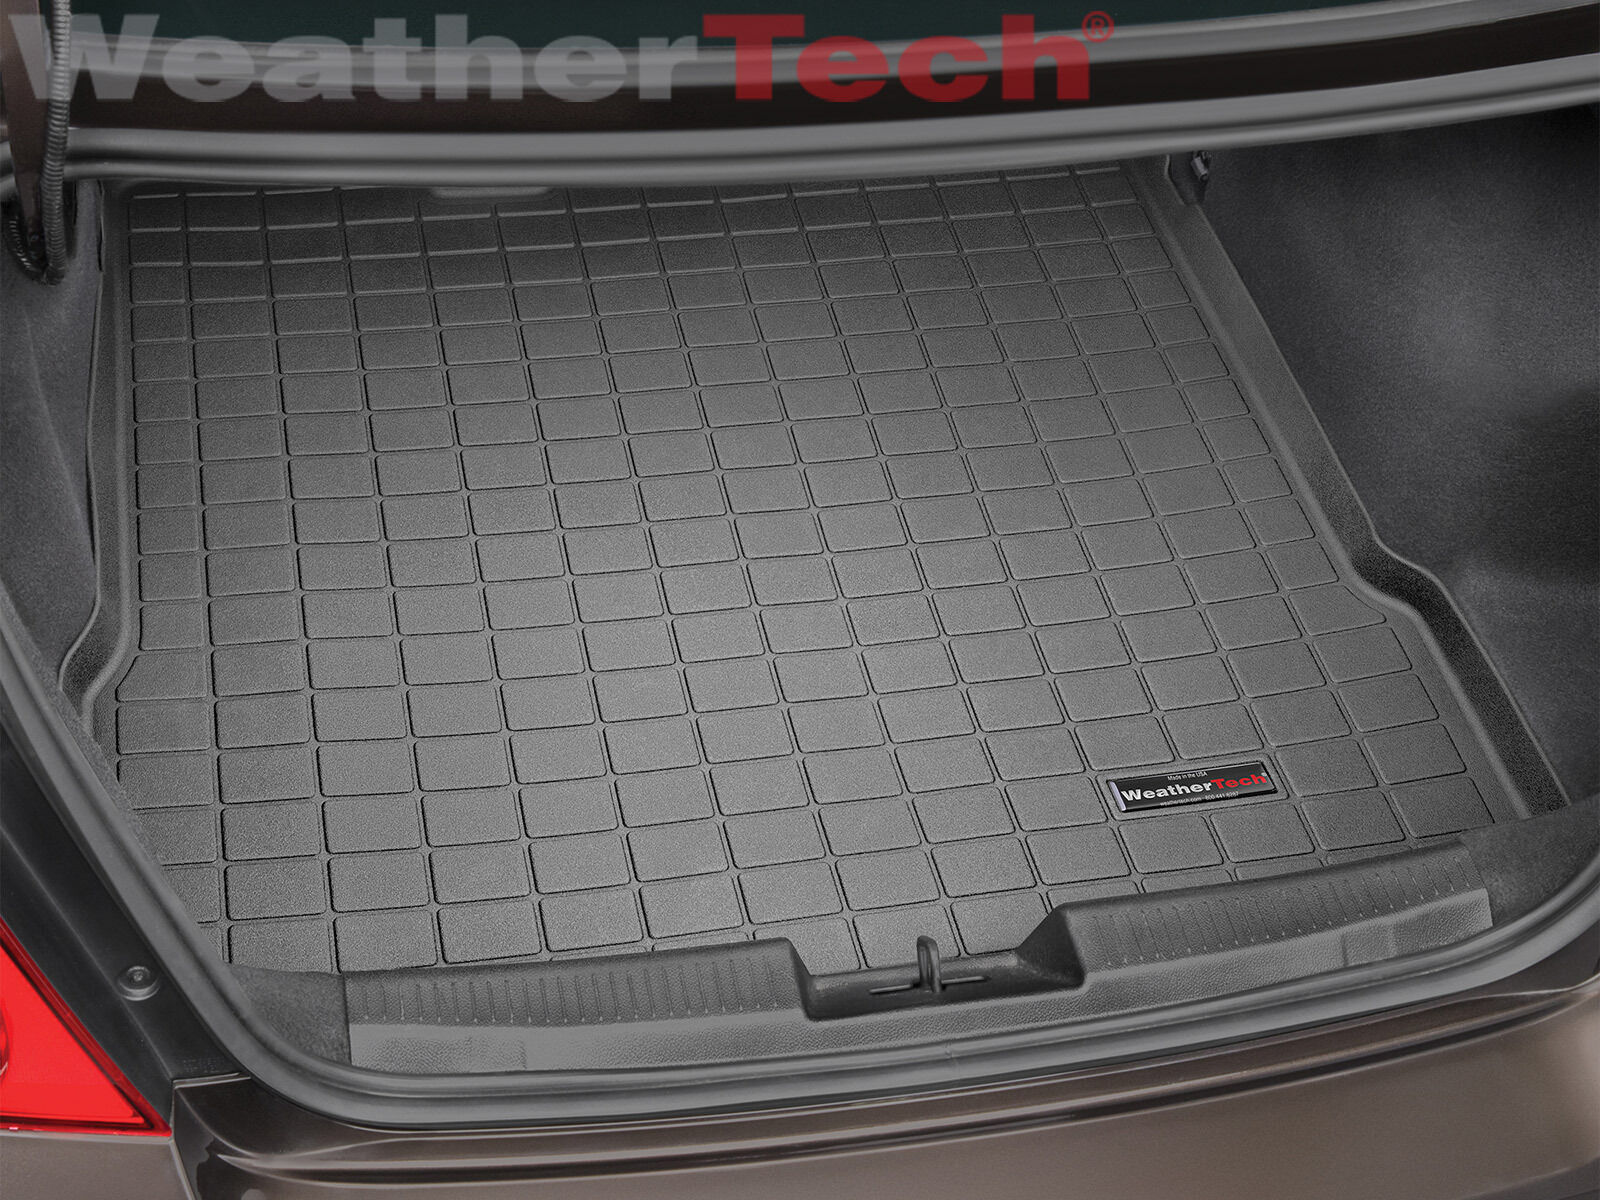 2012-2018 Black WeatherTech Cargo Liner Trunk Mat for Chevy Sonic Sedan